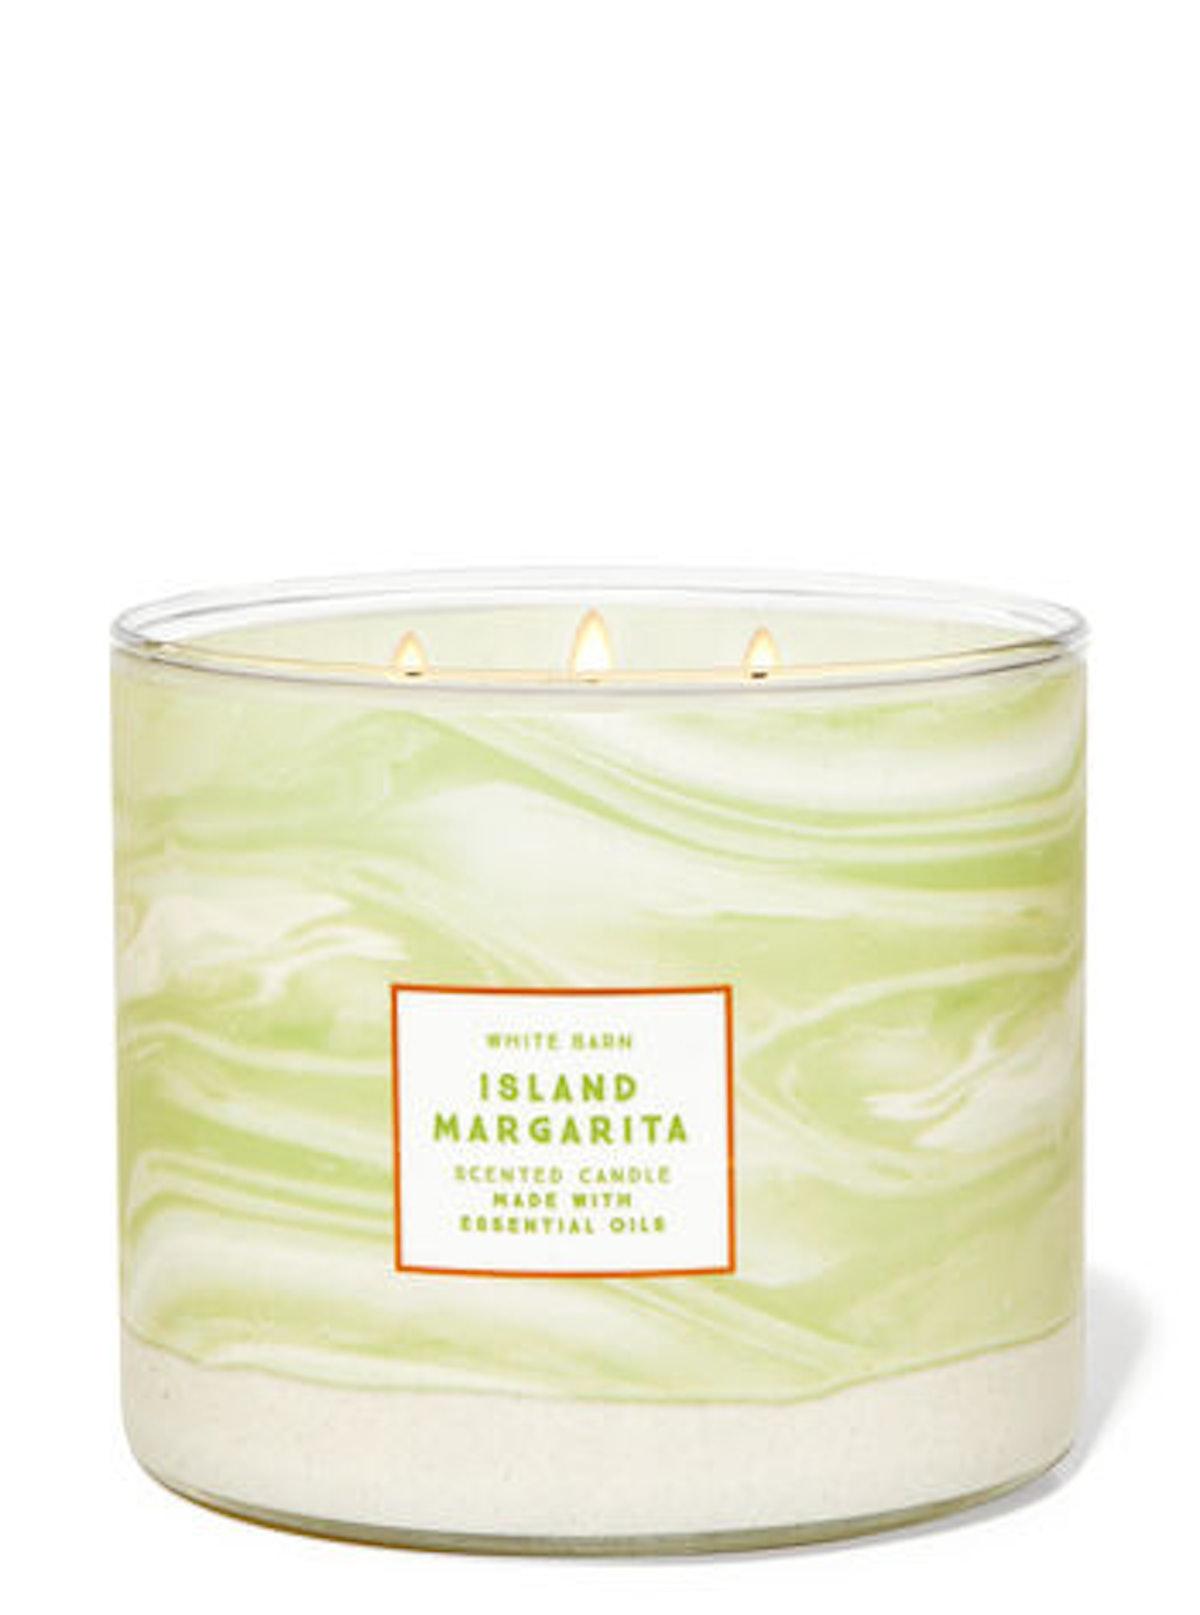 Island Margarita Three-Wick Candle